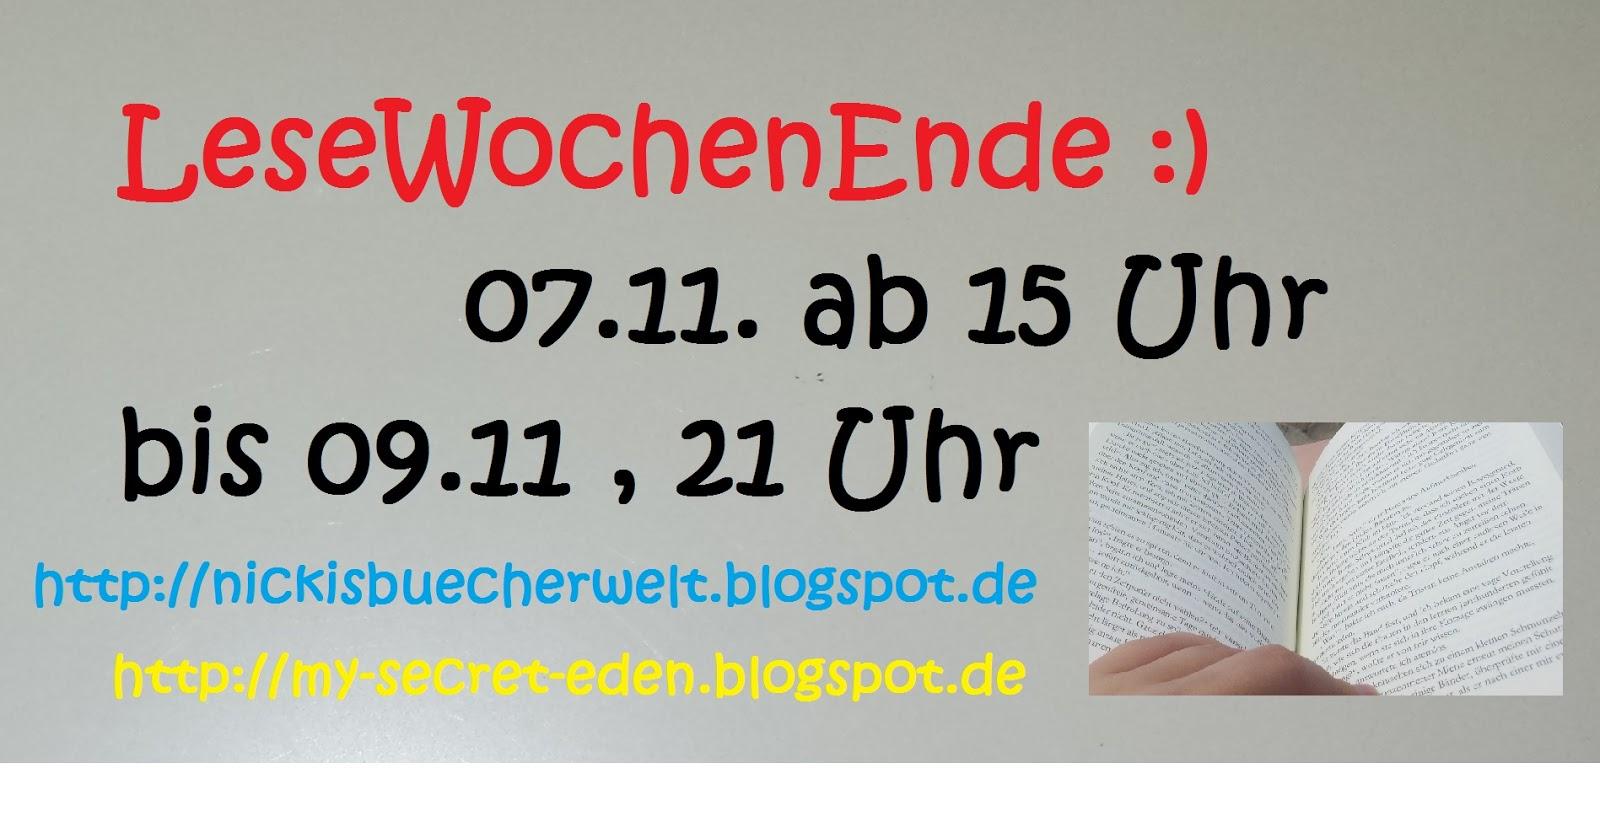 [Lesewochenende] 07.11.14 bis 09.11.14 – Tag #02